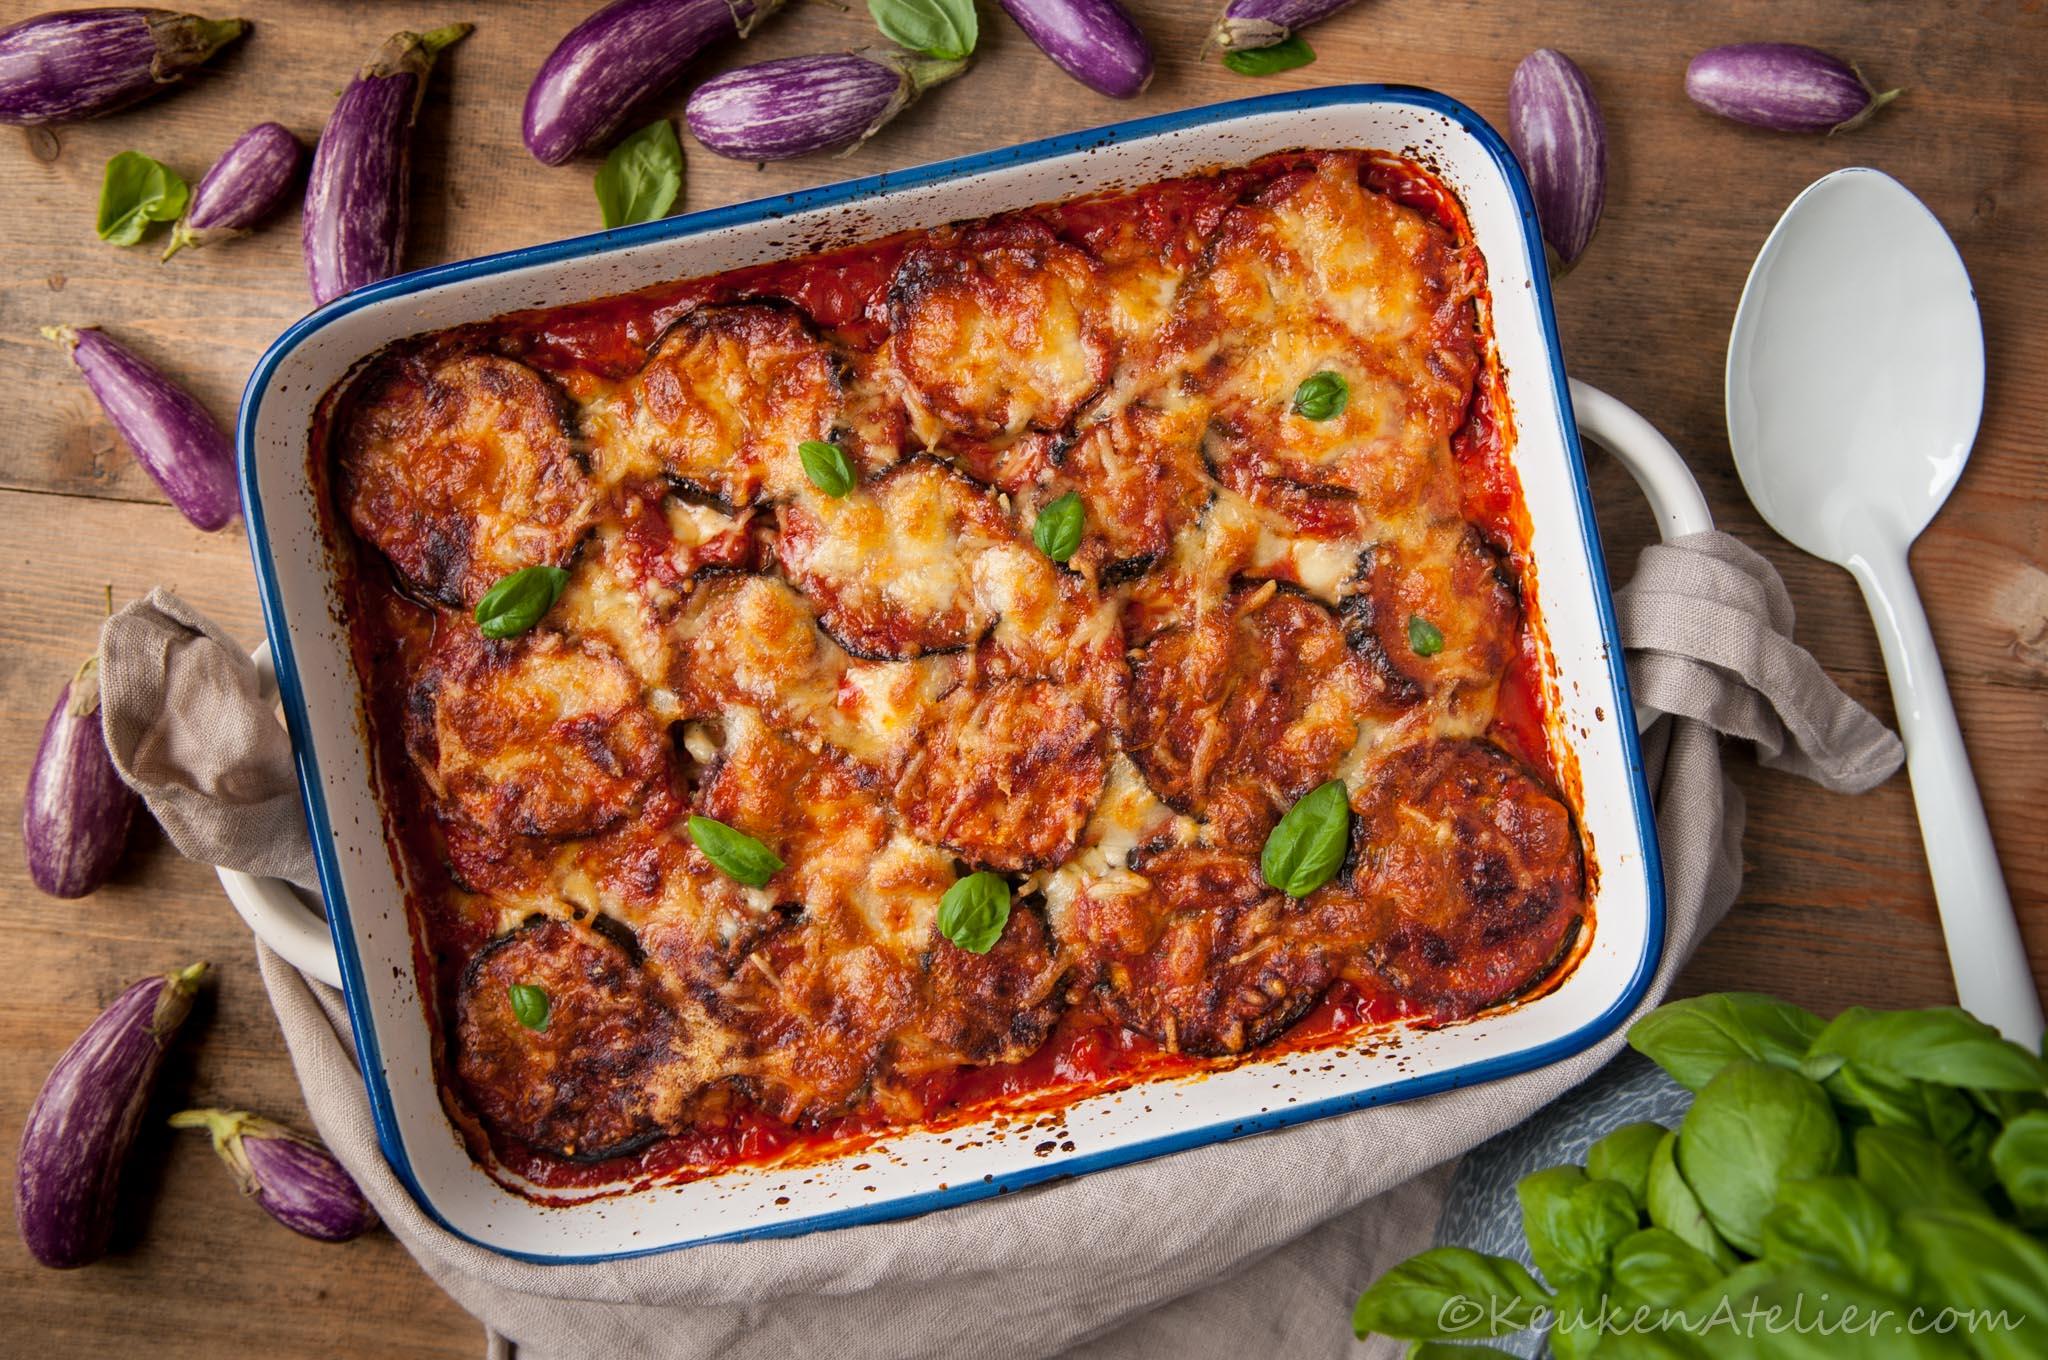 aubergine lasagne 1 | keukenatelier.com